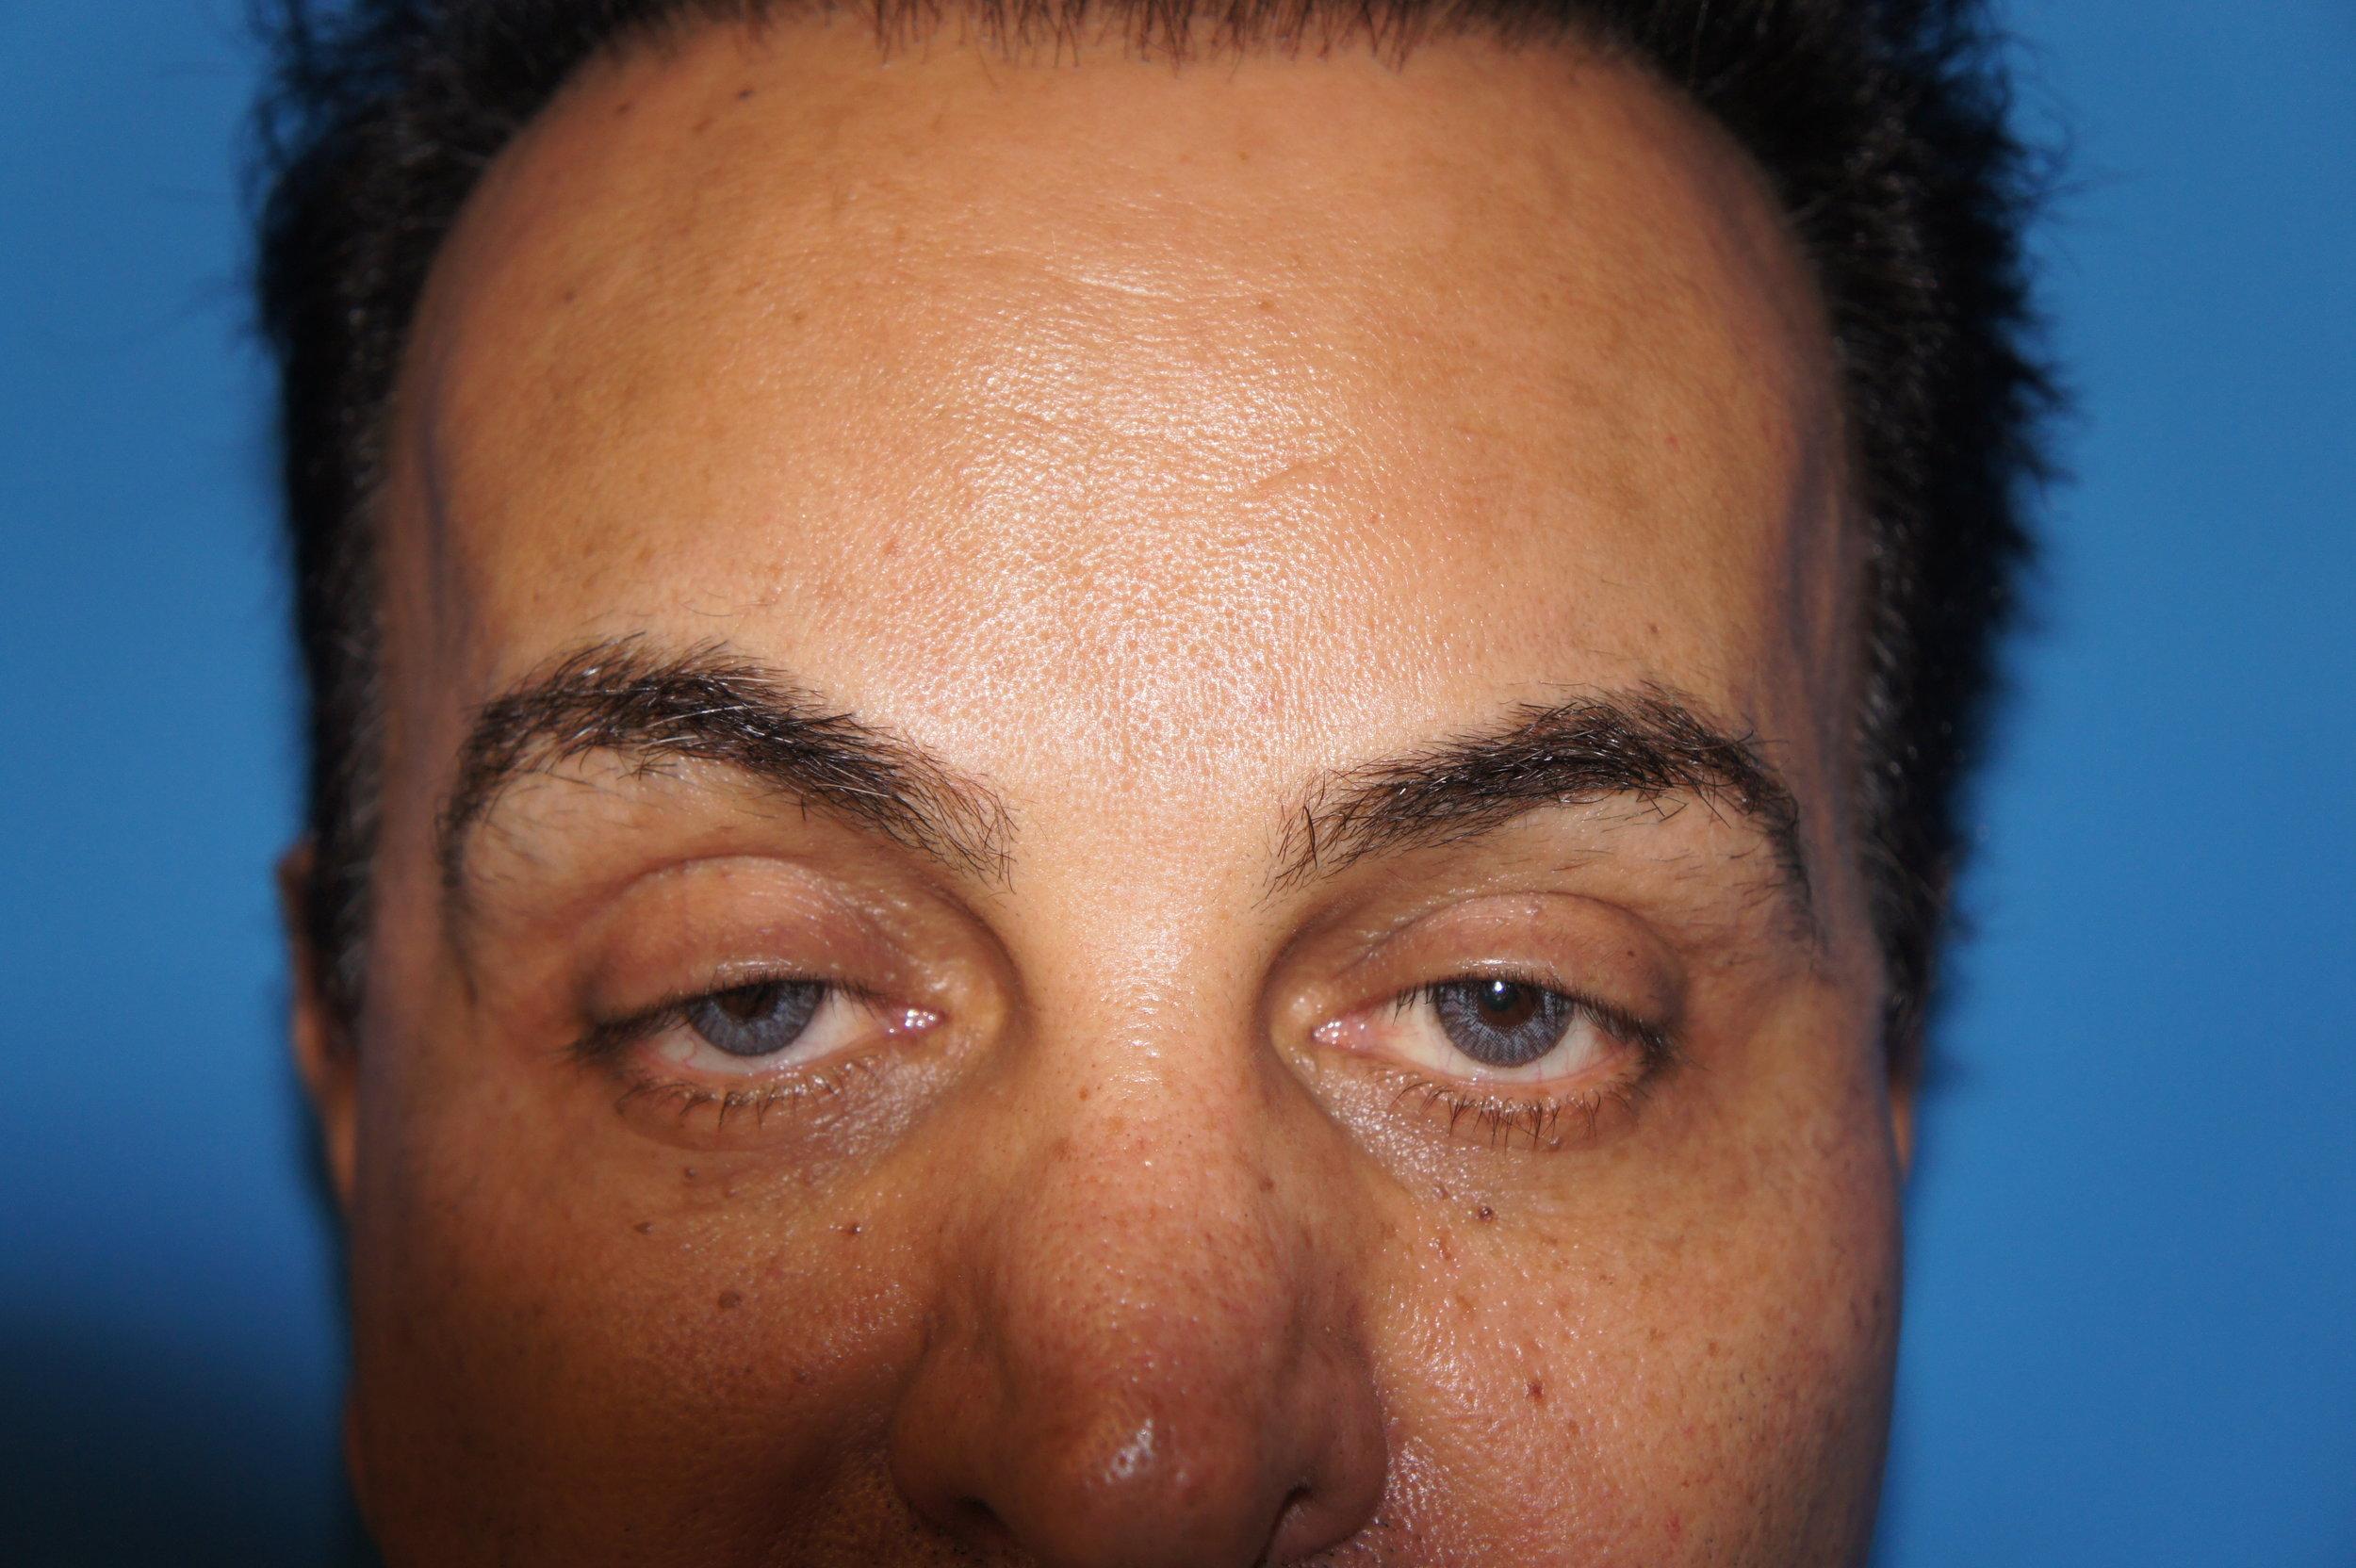 Upper Eyelids, Before Asymmetric Ptosis